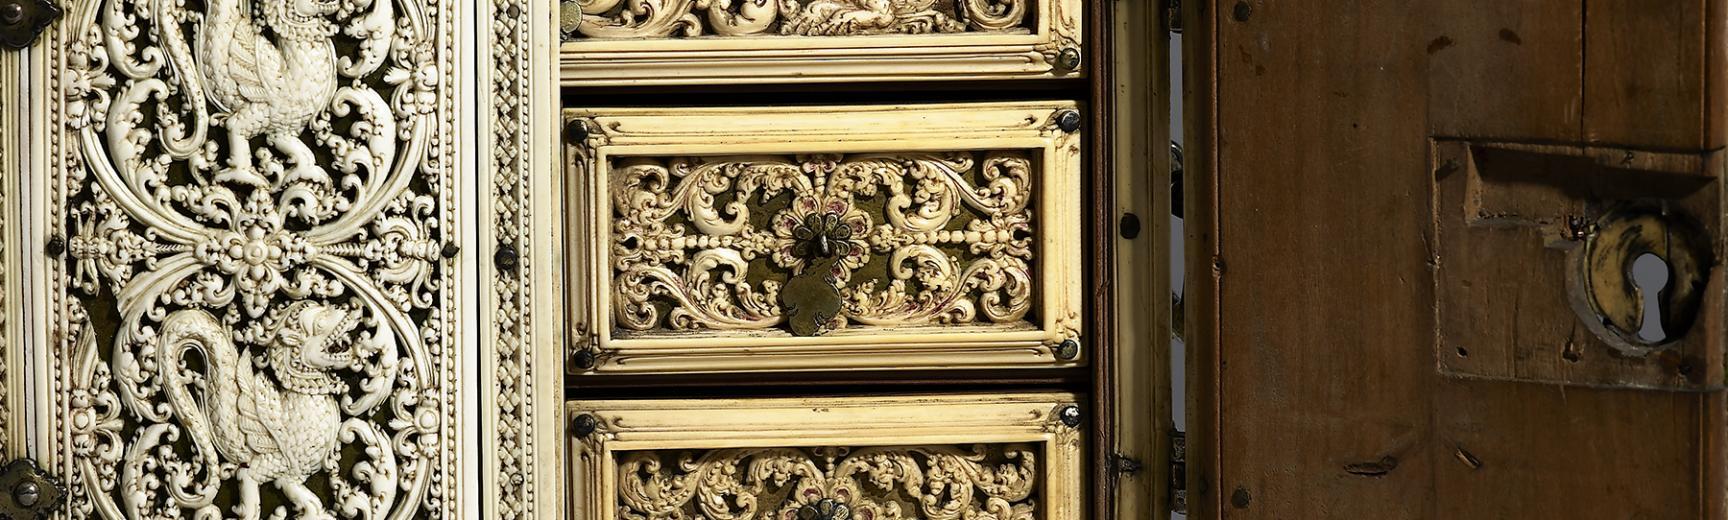 Ivory casket (detail), Sri Lanka, 1650-1700